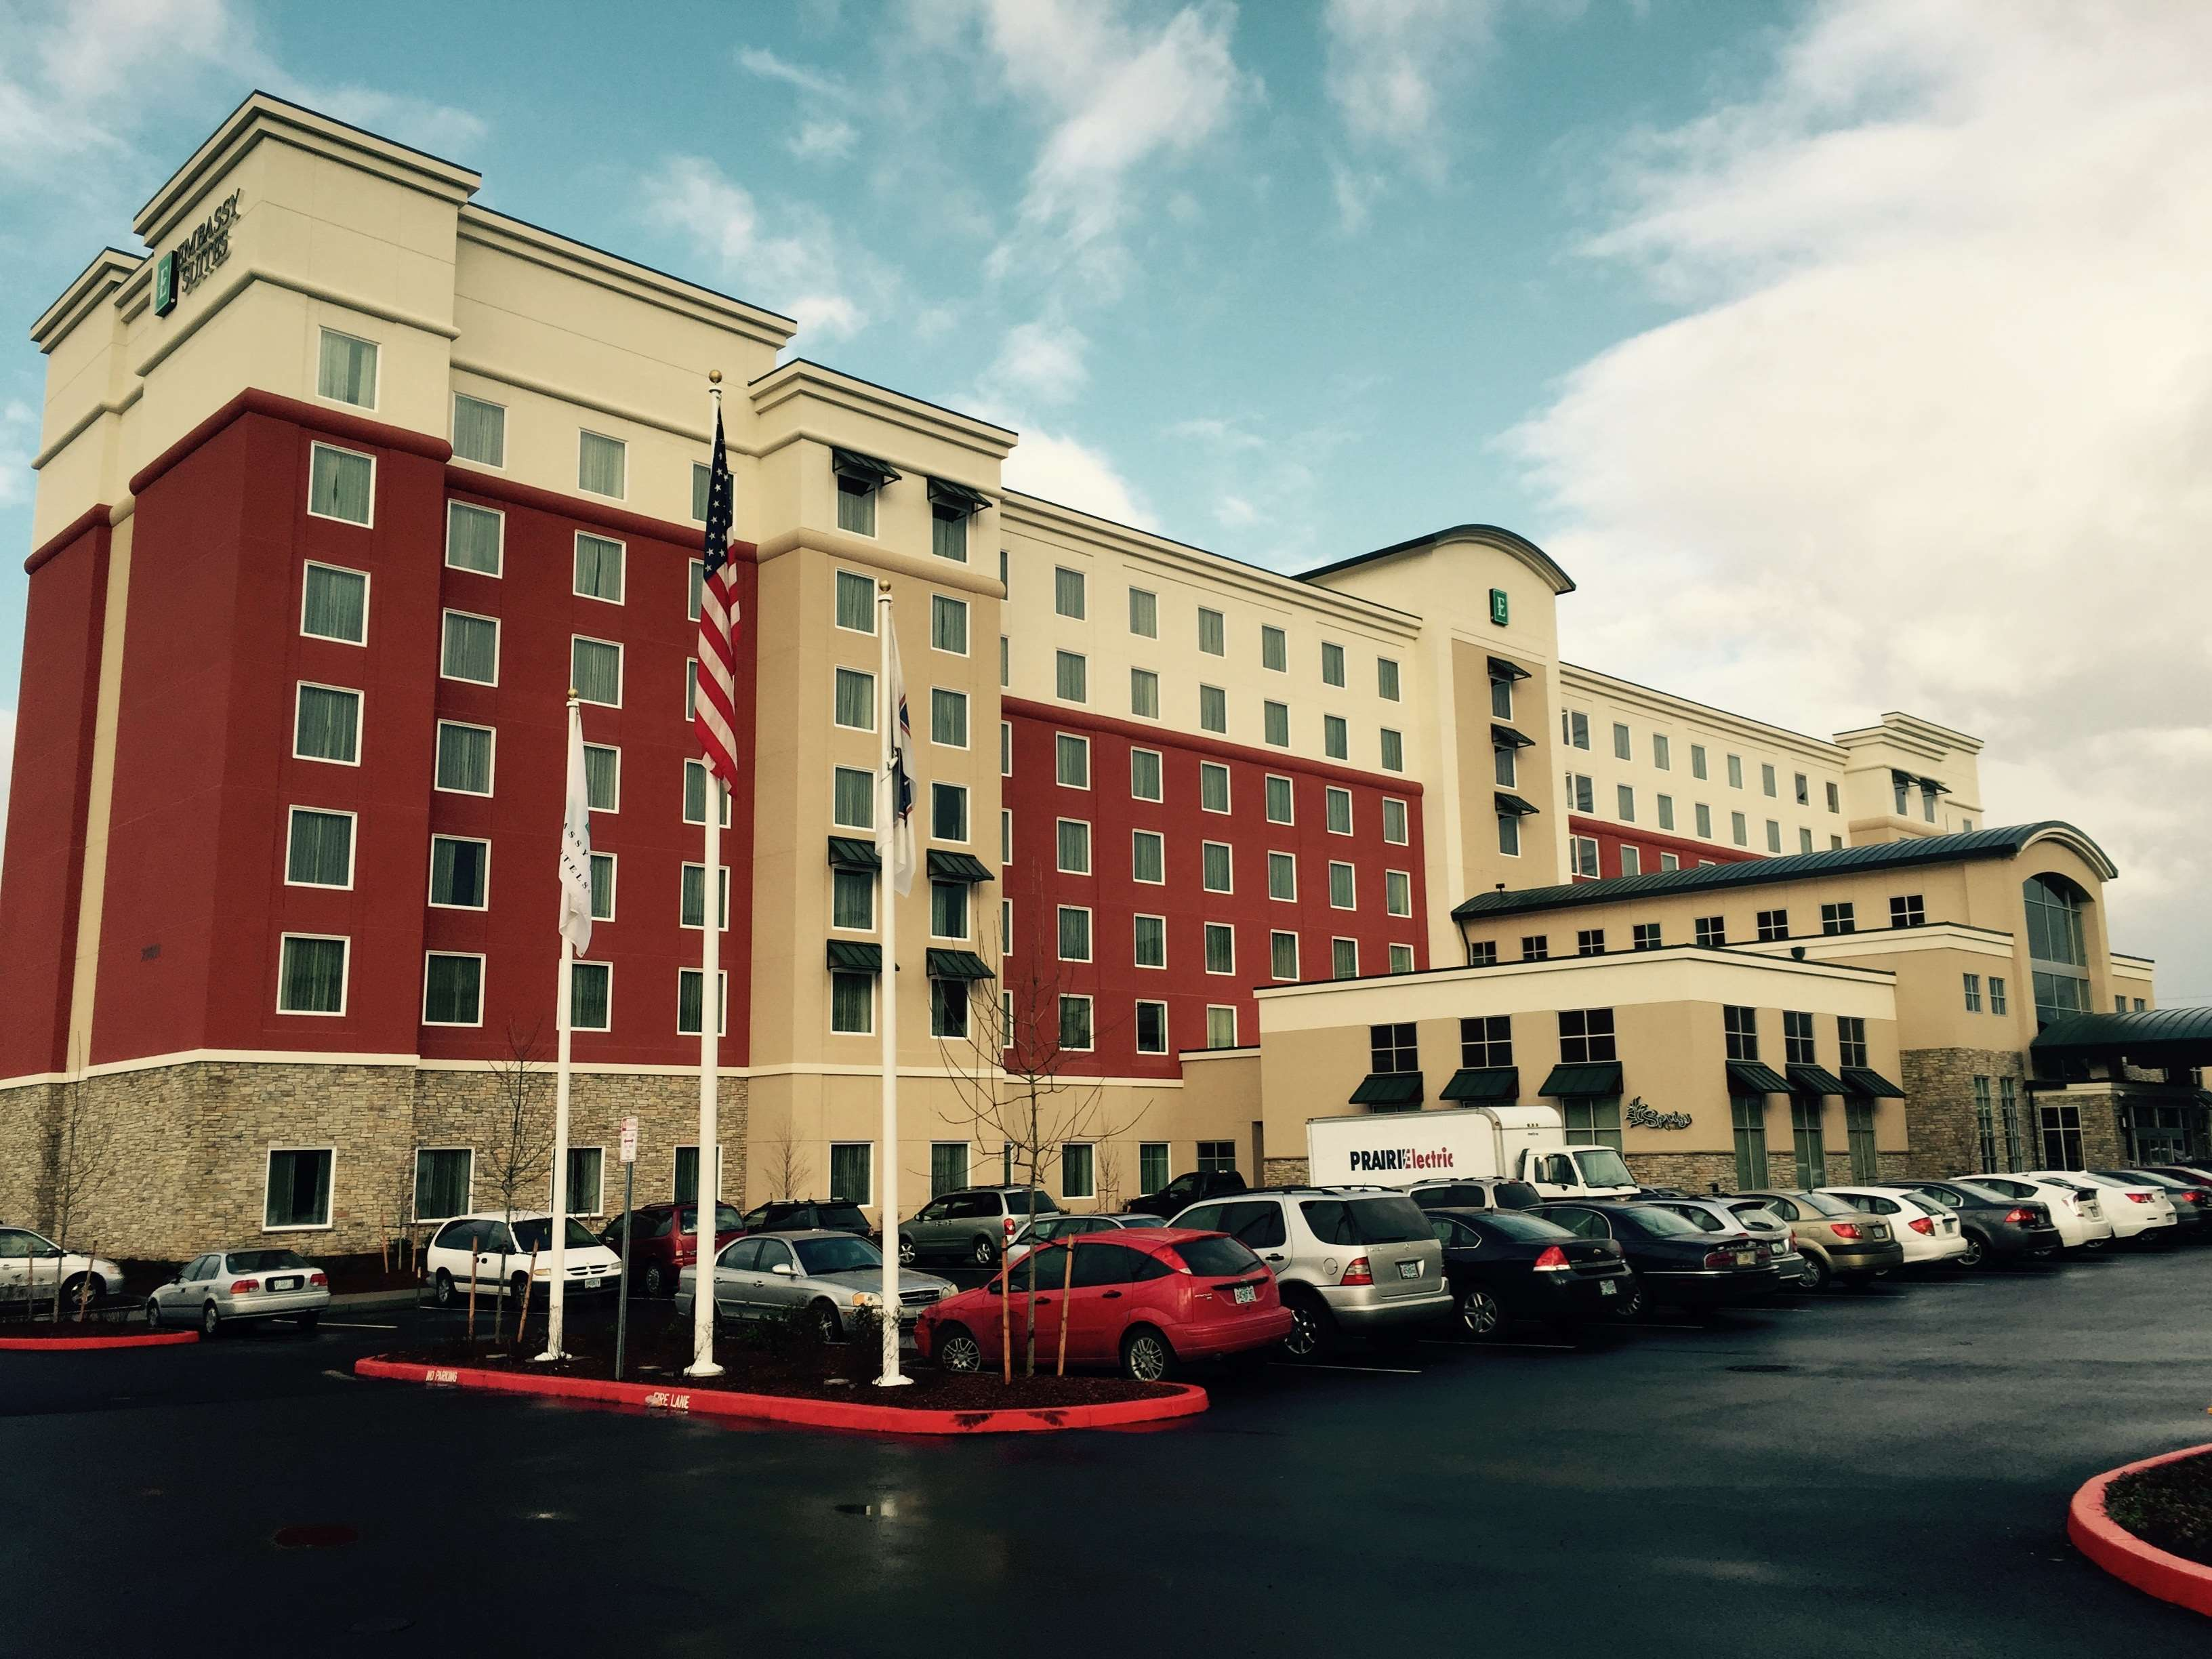 Embassy Suites by Hilton Portland Hillsboro, Oregon image 1